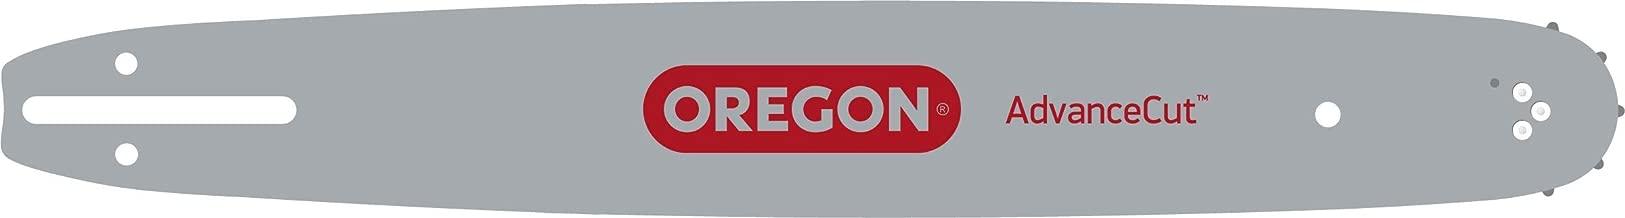 Oregon 140SXEA041 AdvanceCut Guide Bar, 14